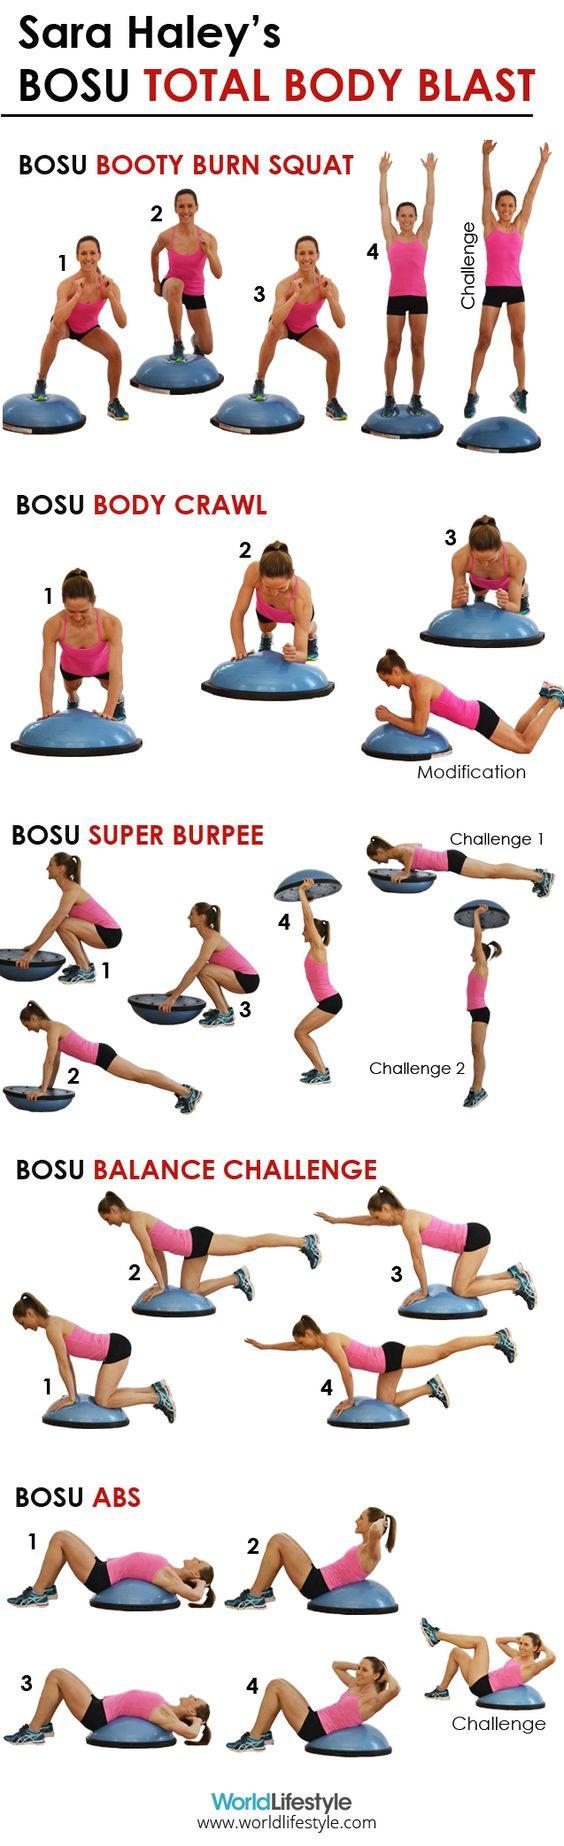 Sara Haley's BOSU Total Body Blast Workout - 5 fierce calorie-burning BOSU moves